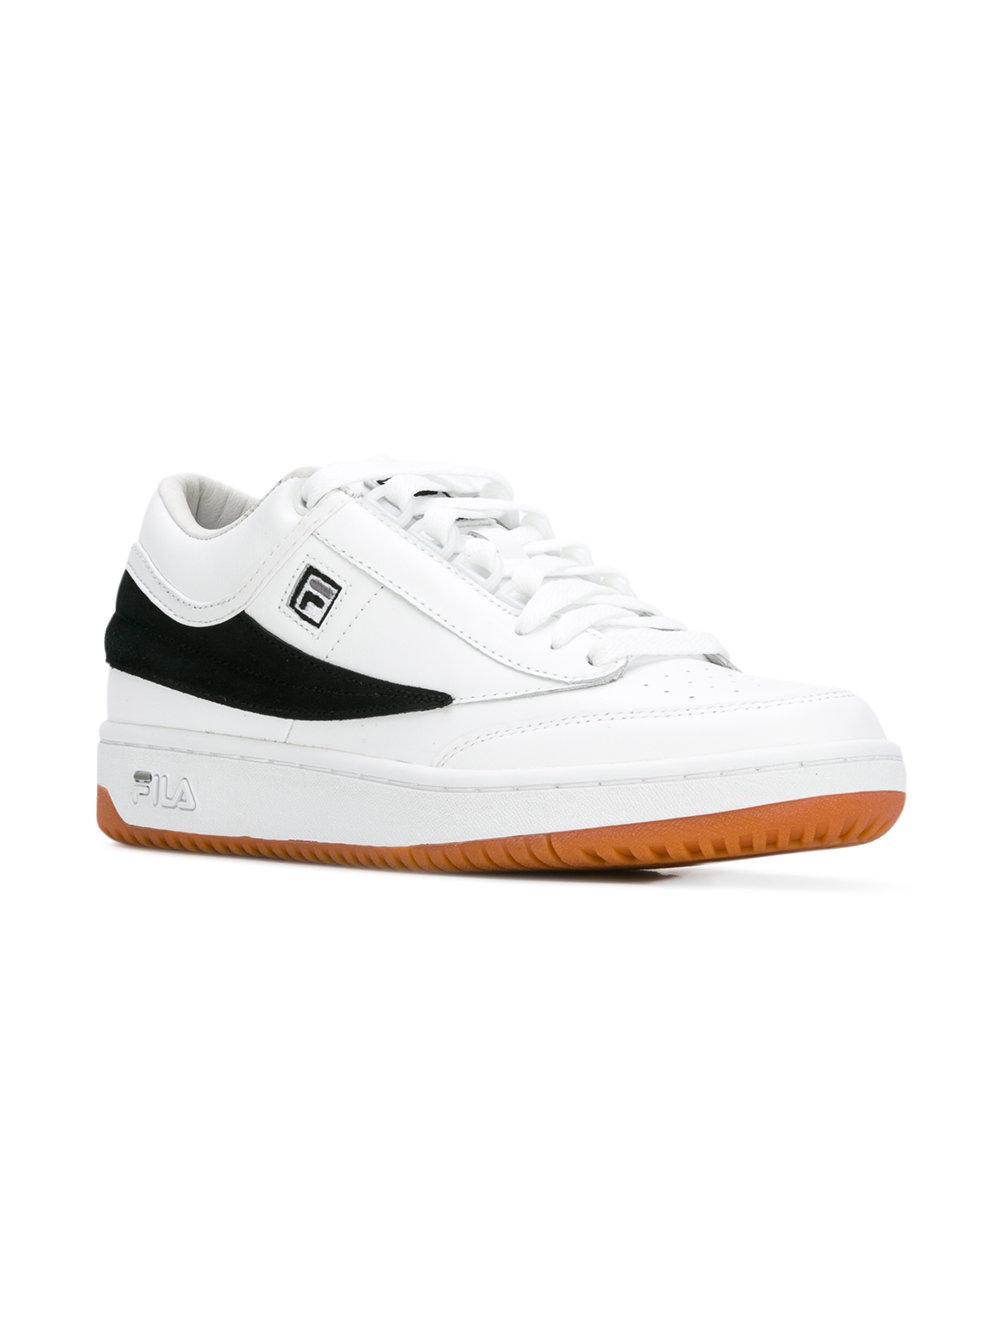 Fila Gosha Rubchinskiy X Sneakers in White for Men | Lyst